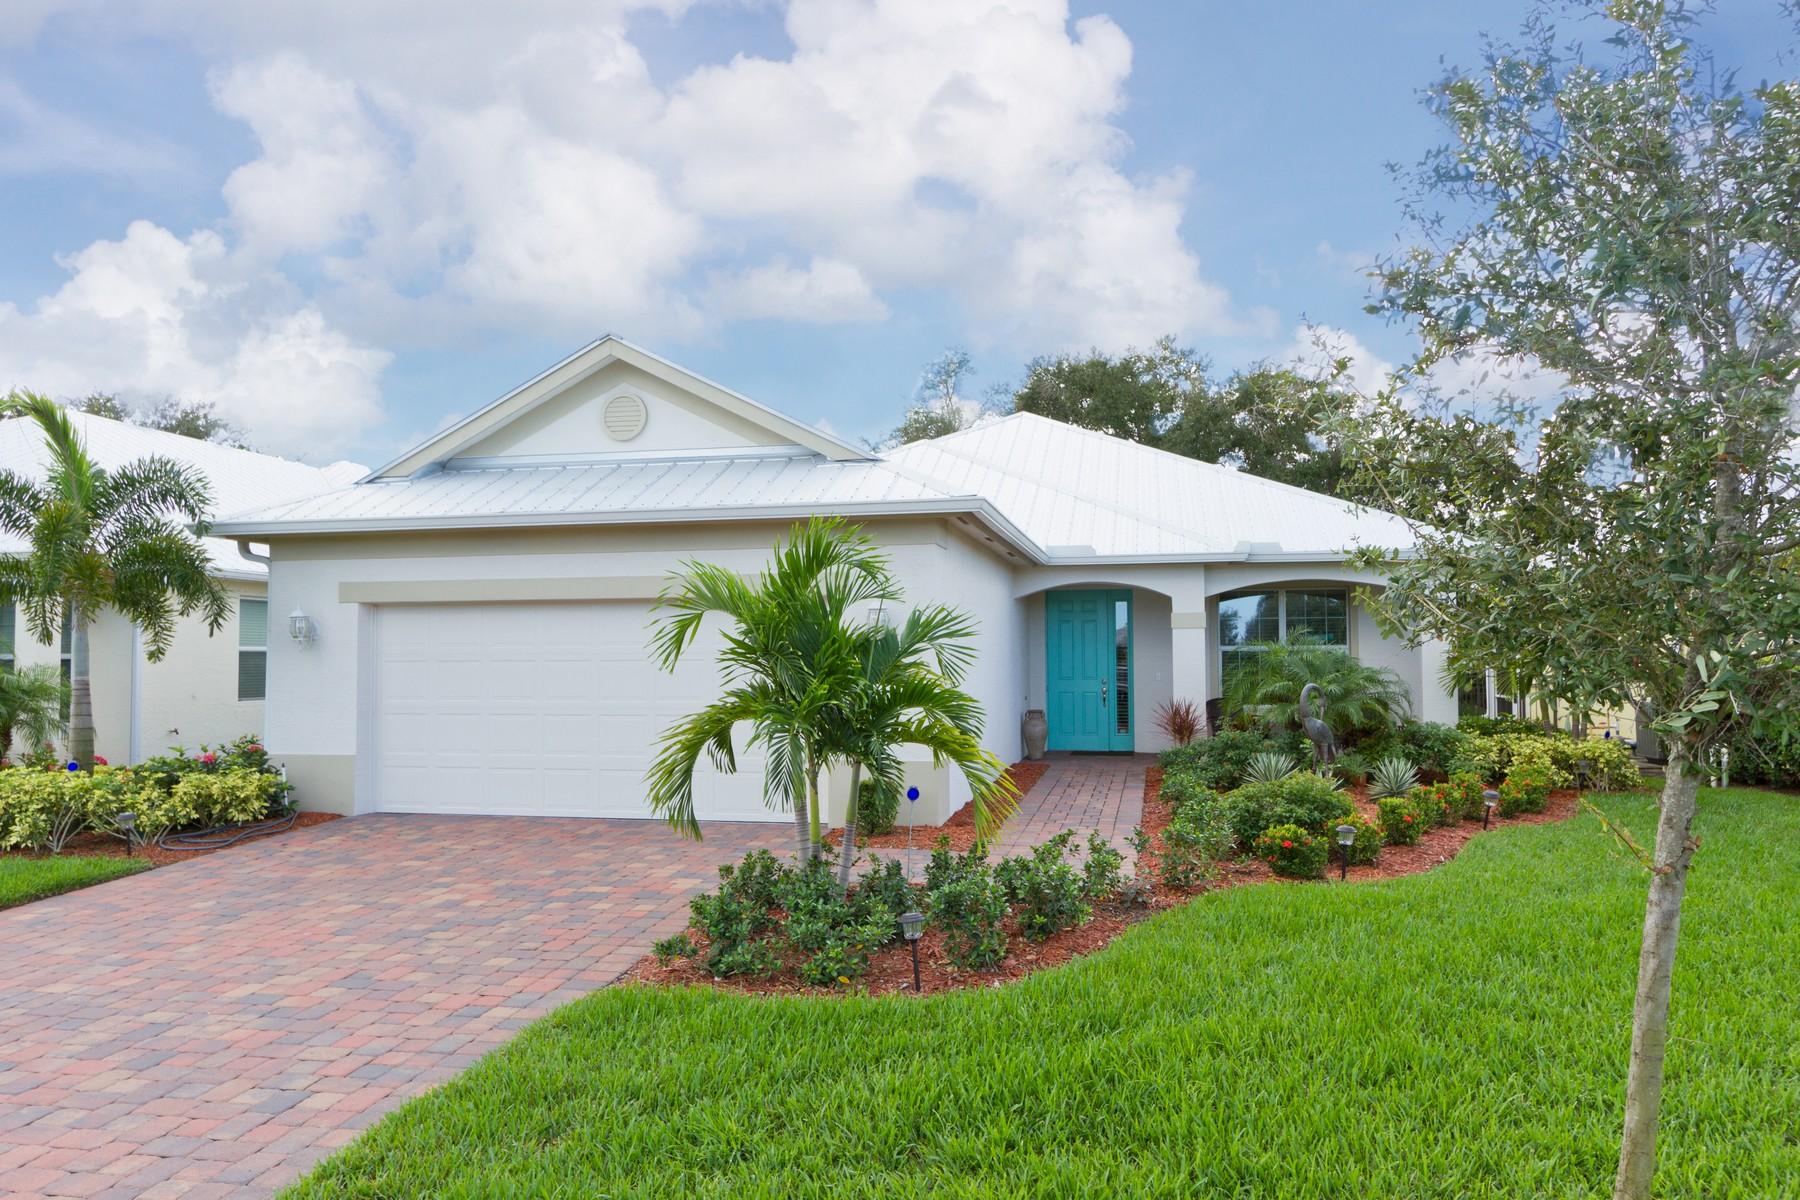 Property 为 销售 在 Immaculate Two Bedroom Plus Den Bimini Model 443 11th Square SW 维罗海滩, 佛罗里达州 32962 美国